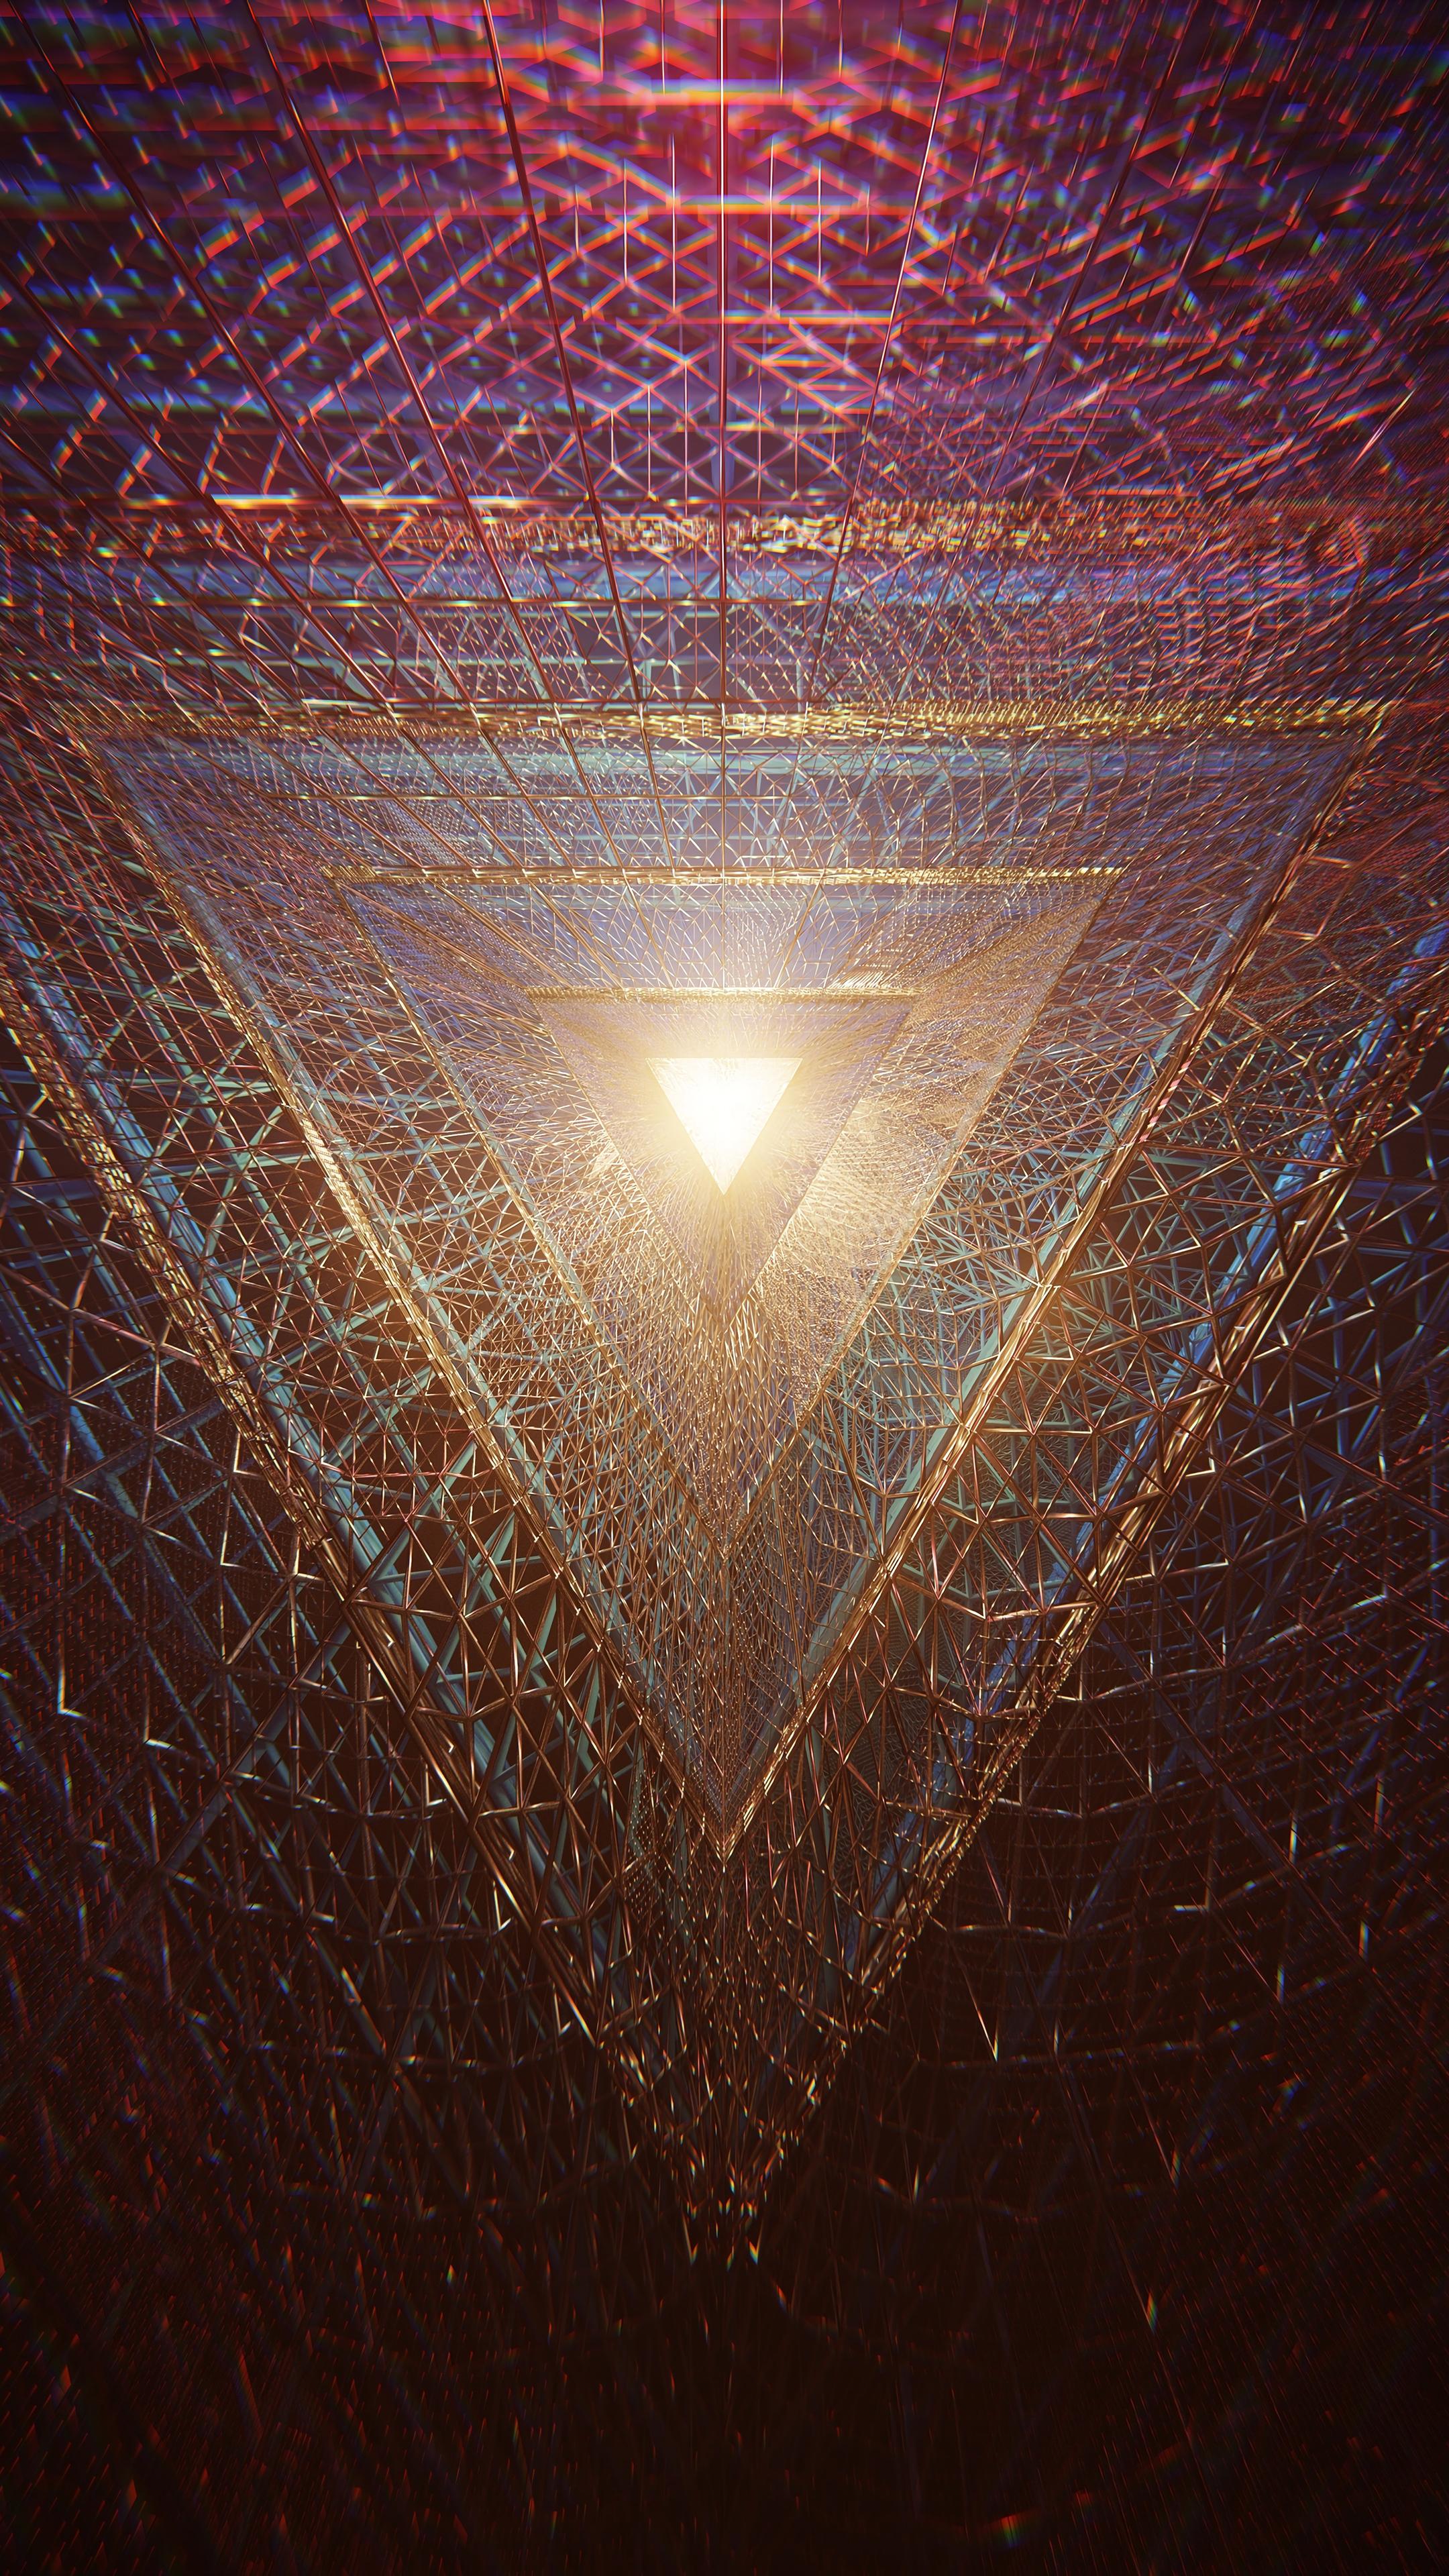 triangle-geometry-abstract-4k-xc.jpg